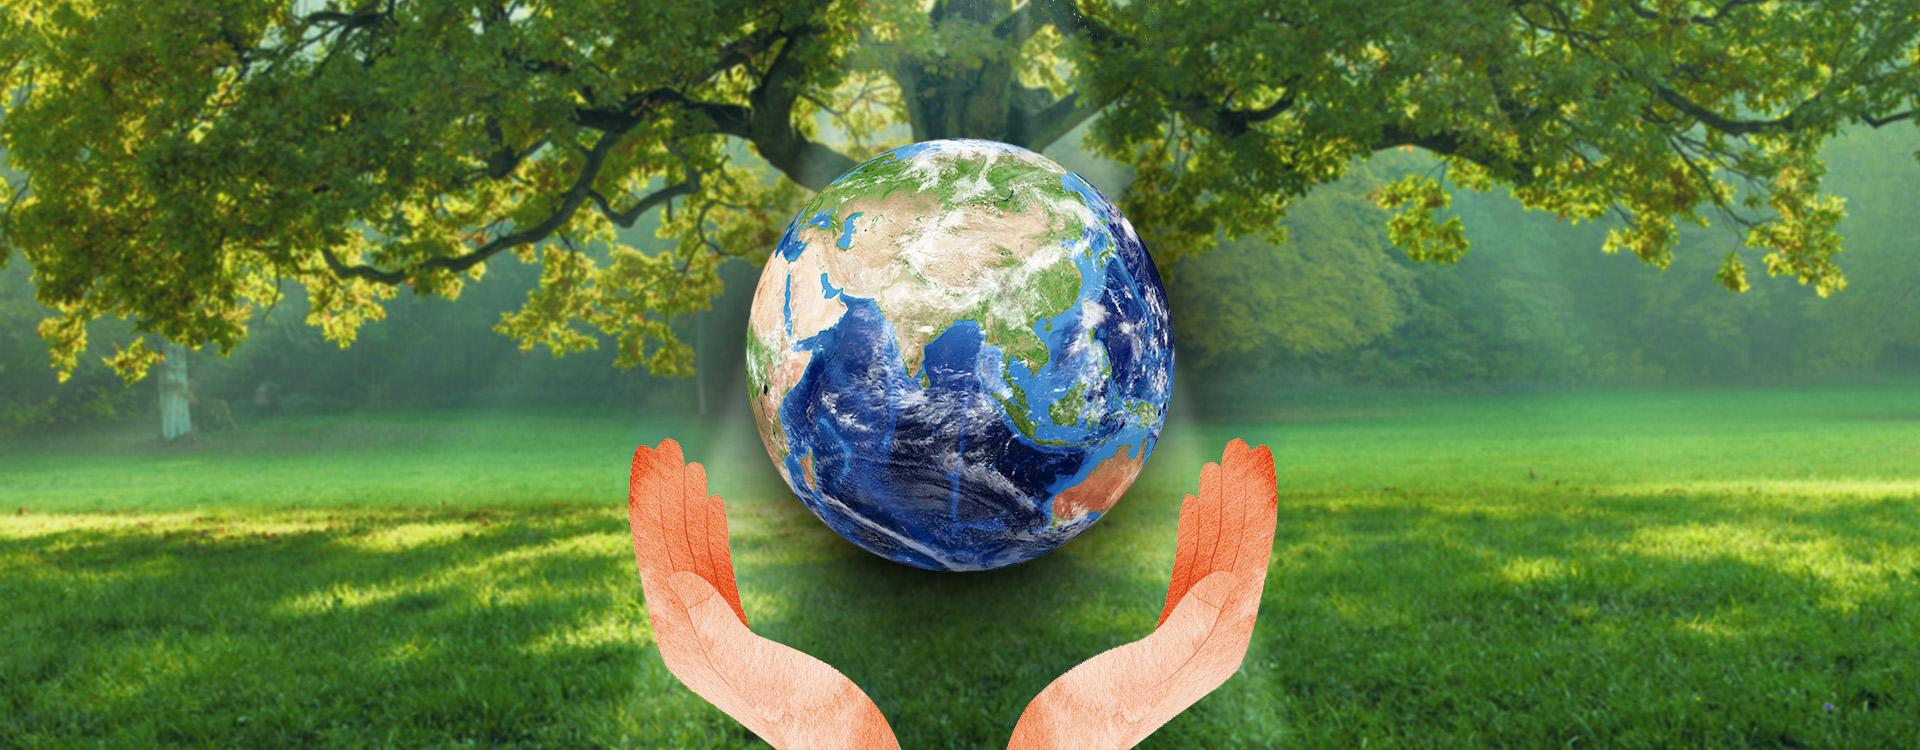 Devic Earth- Clean Earth, Green Earth